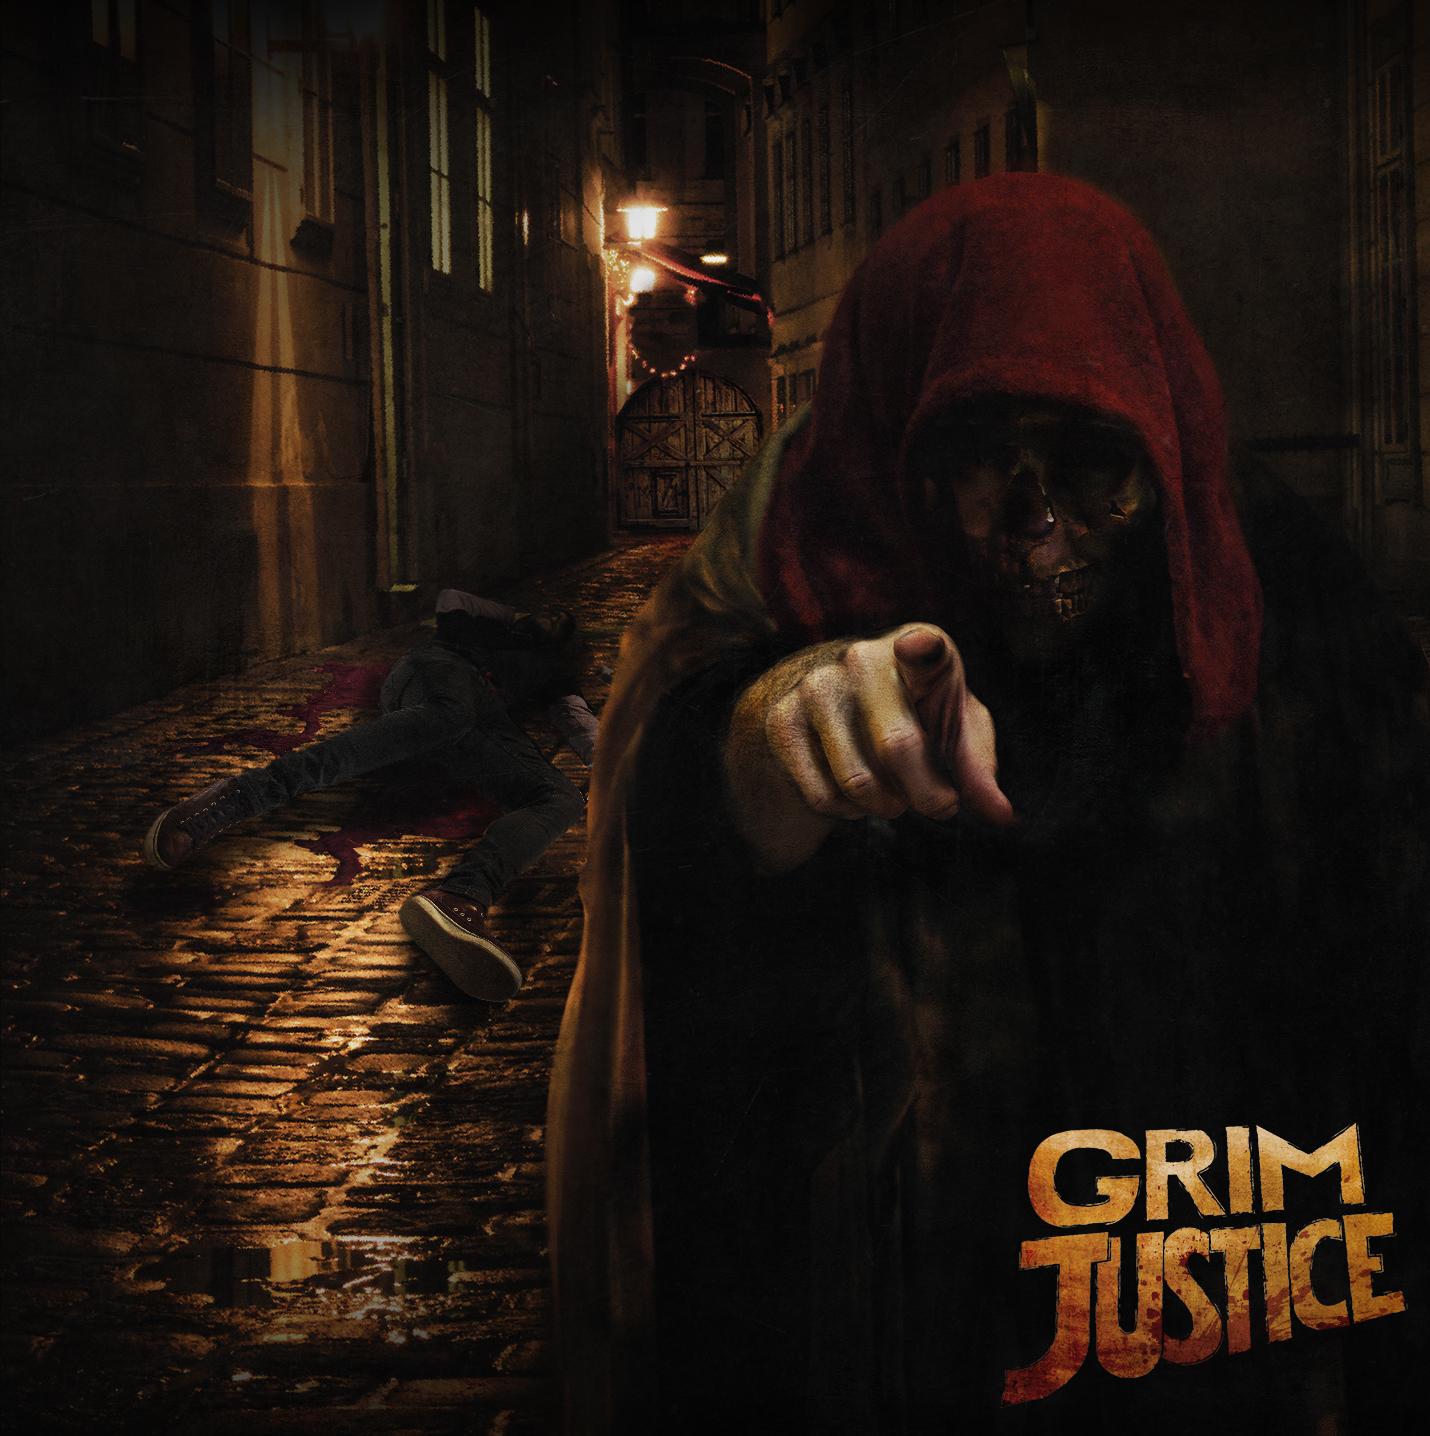 Grim Justice - Grim Justice